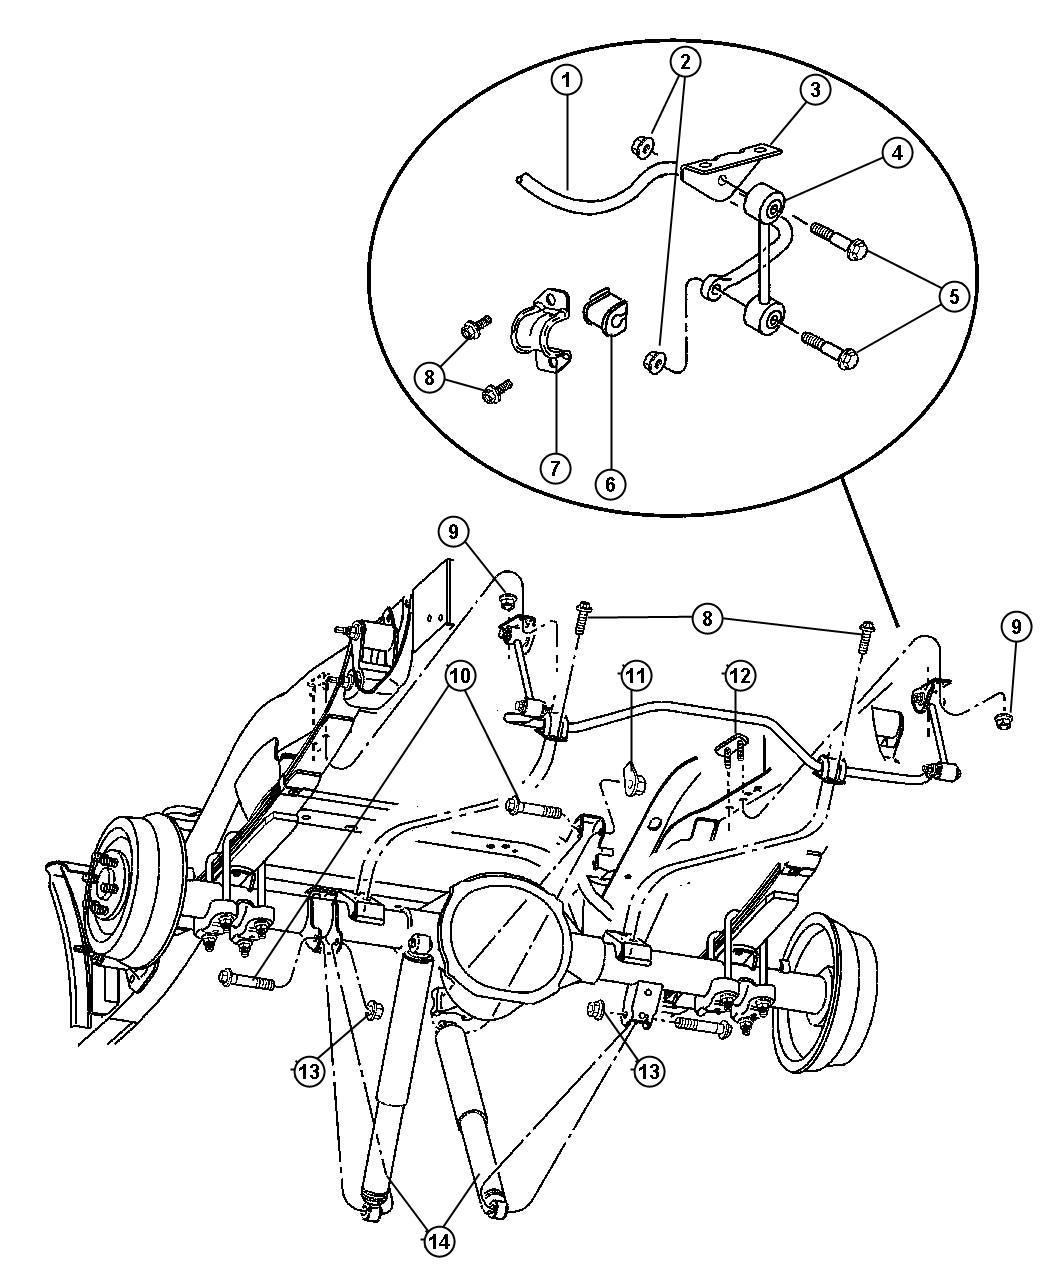 dodge dakota suspension parts diagram 1999 ford f150 starter solenoid wiring shock absorber rear genuine mopar 52106927ab